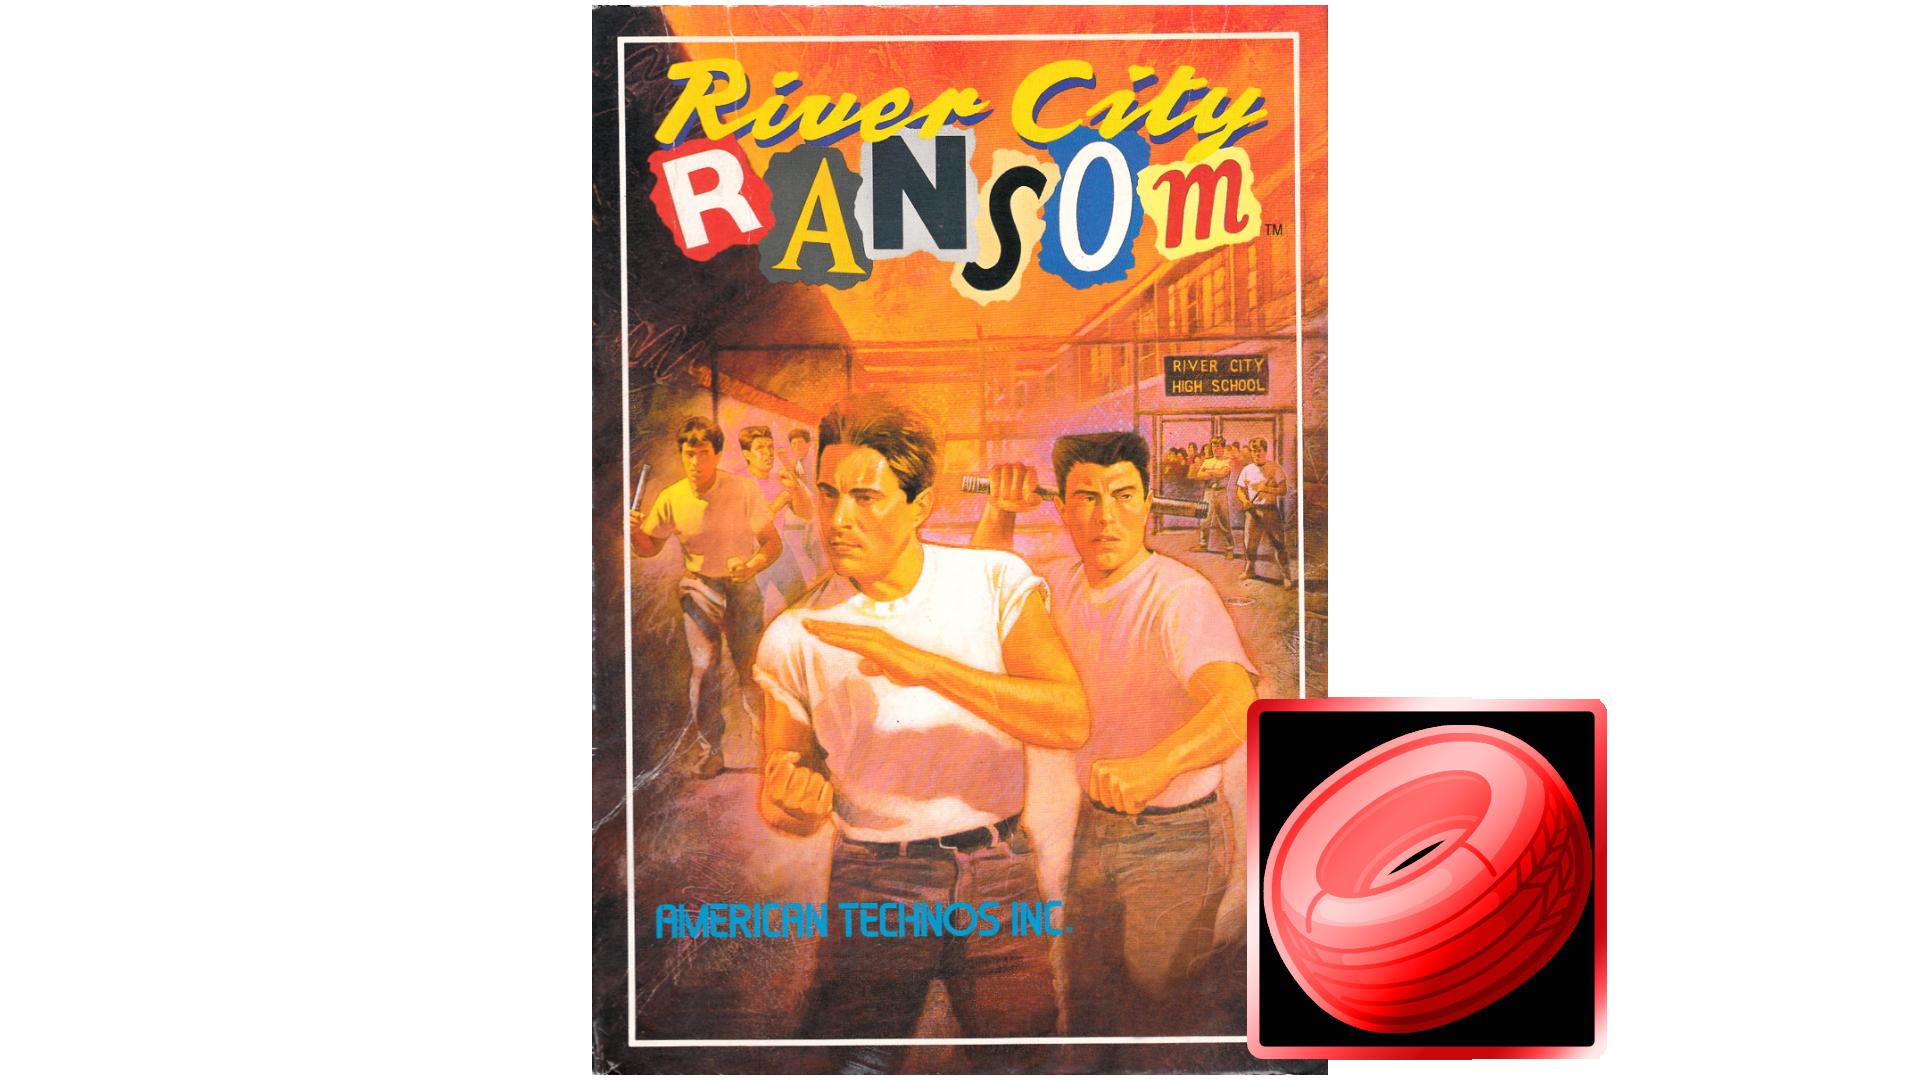 Icon for Reverberation of retro sound